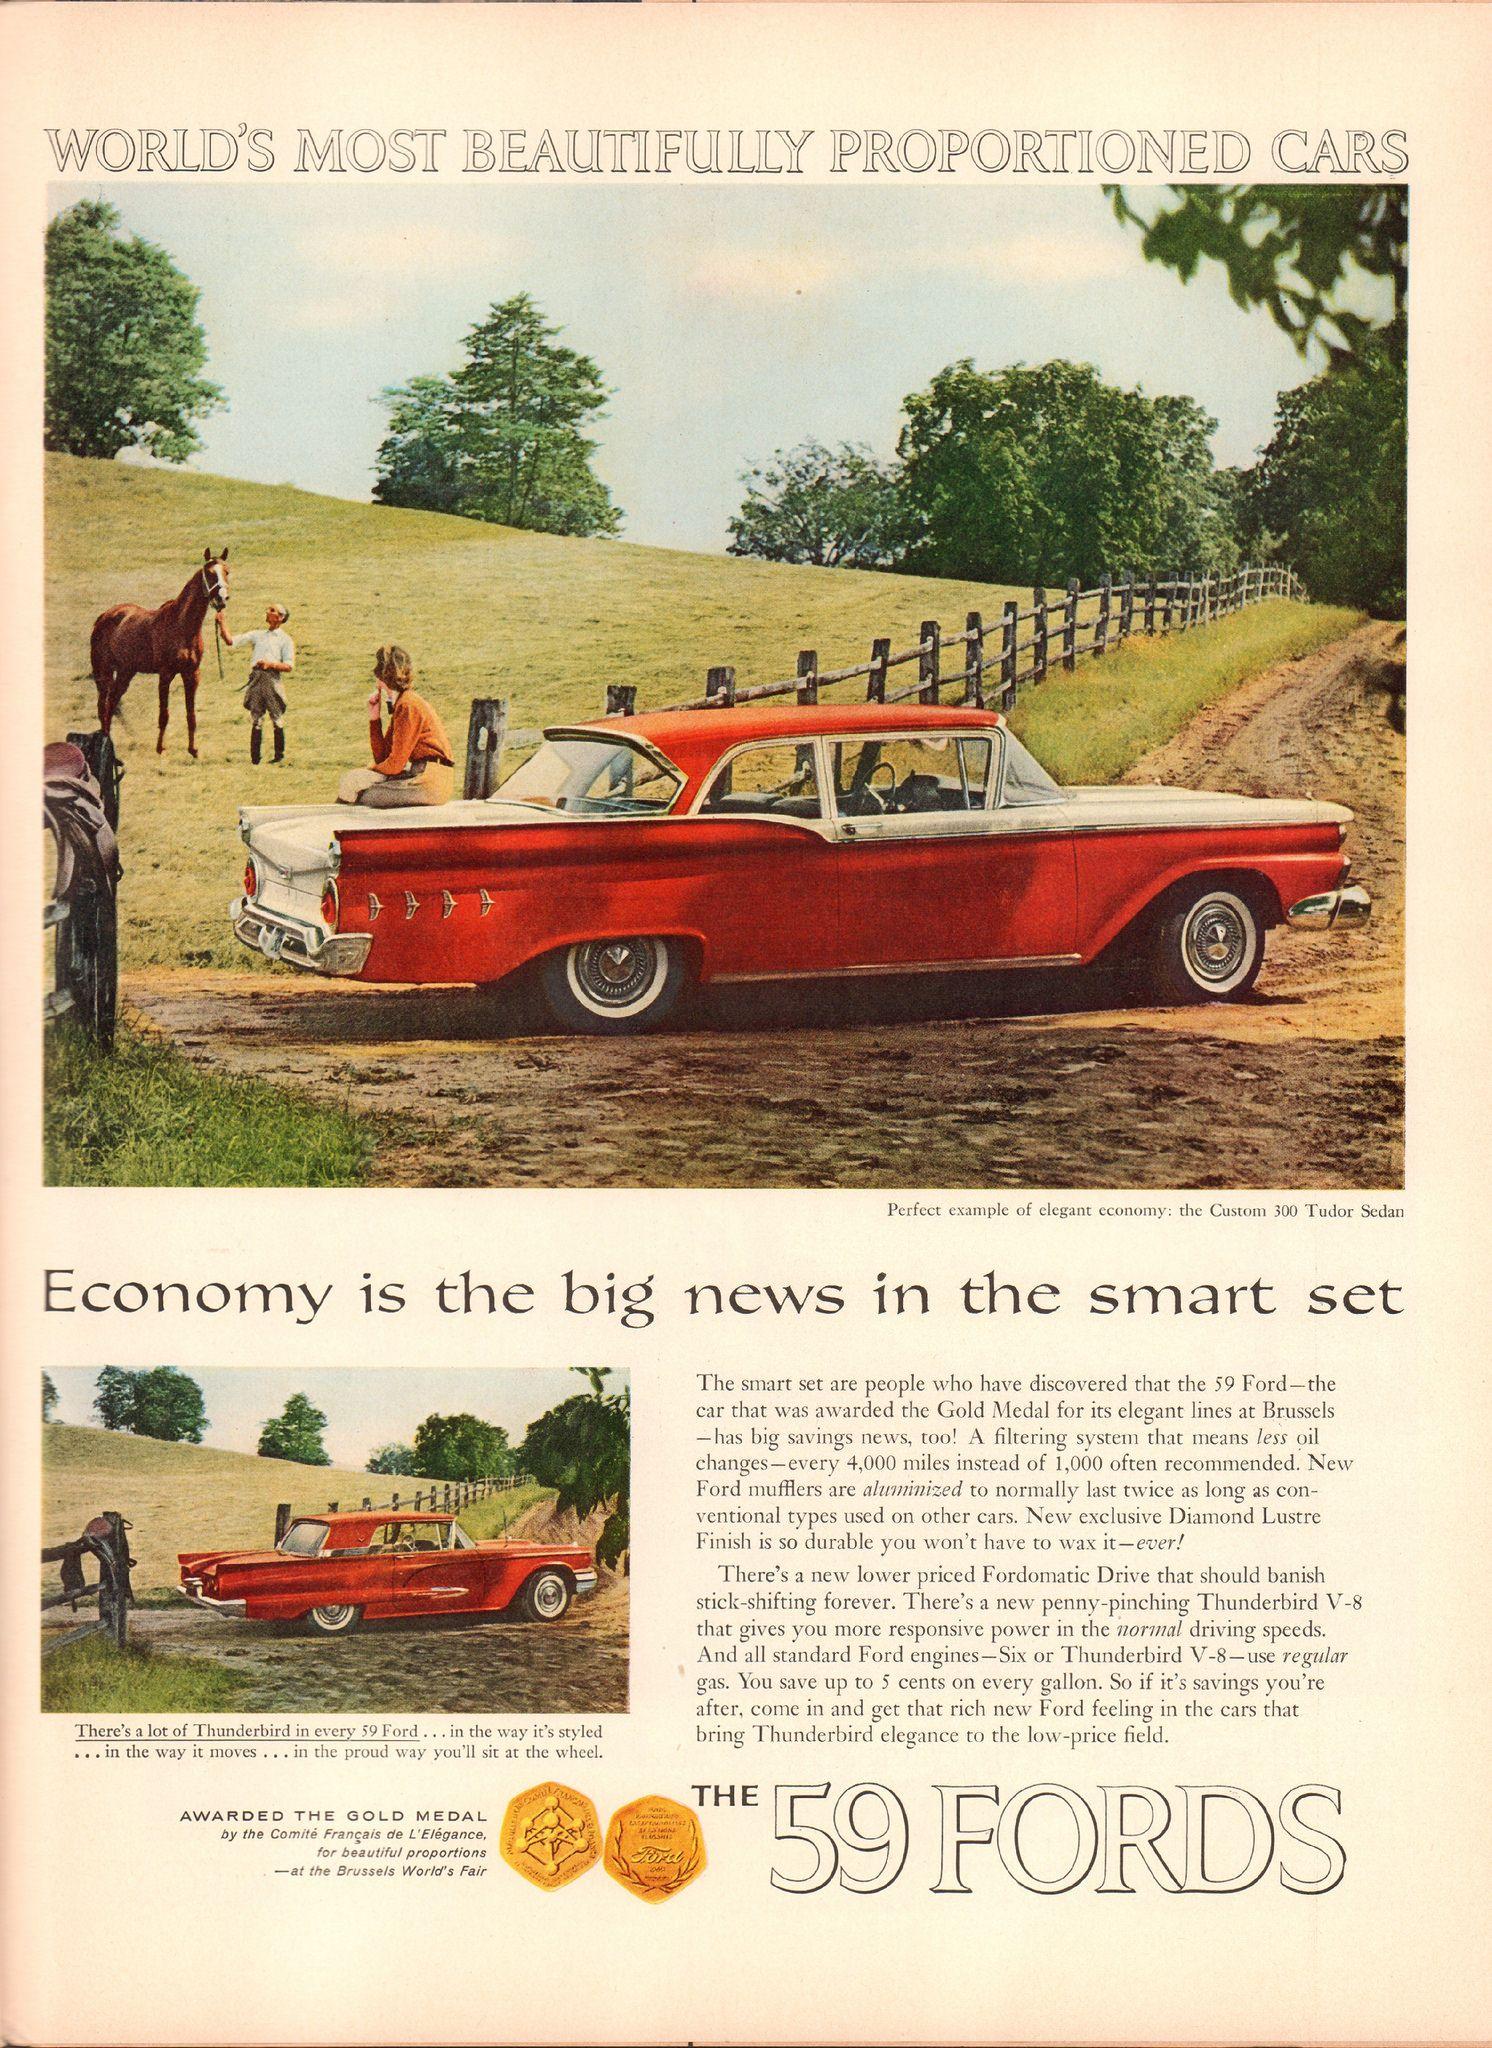 1959 ford custom 300 advertisement life magazine november